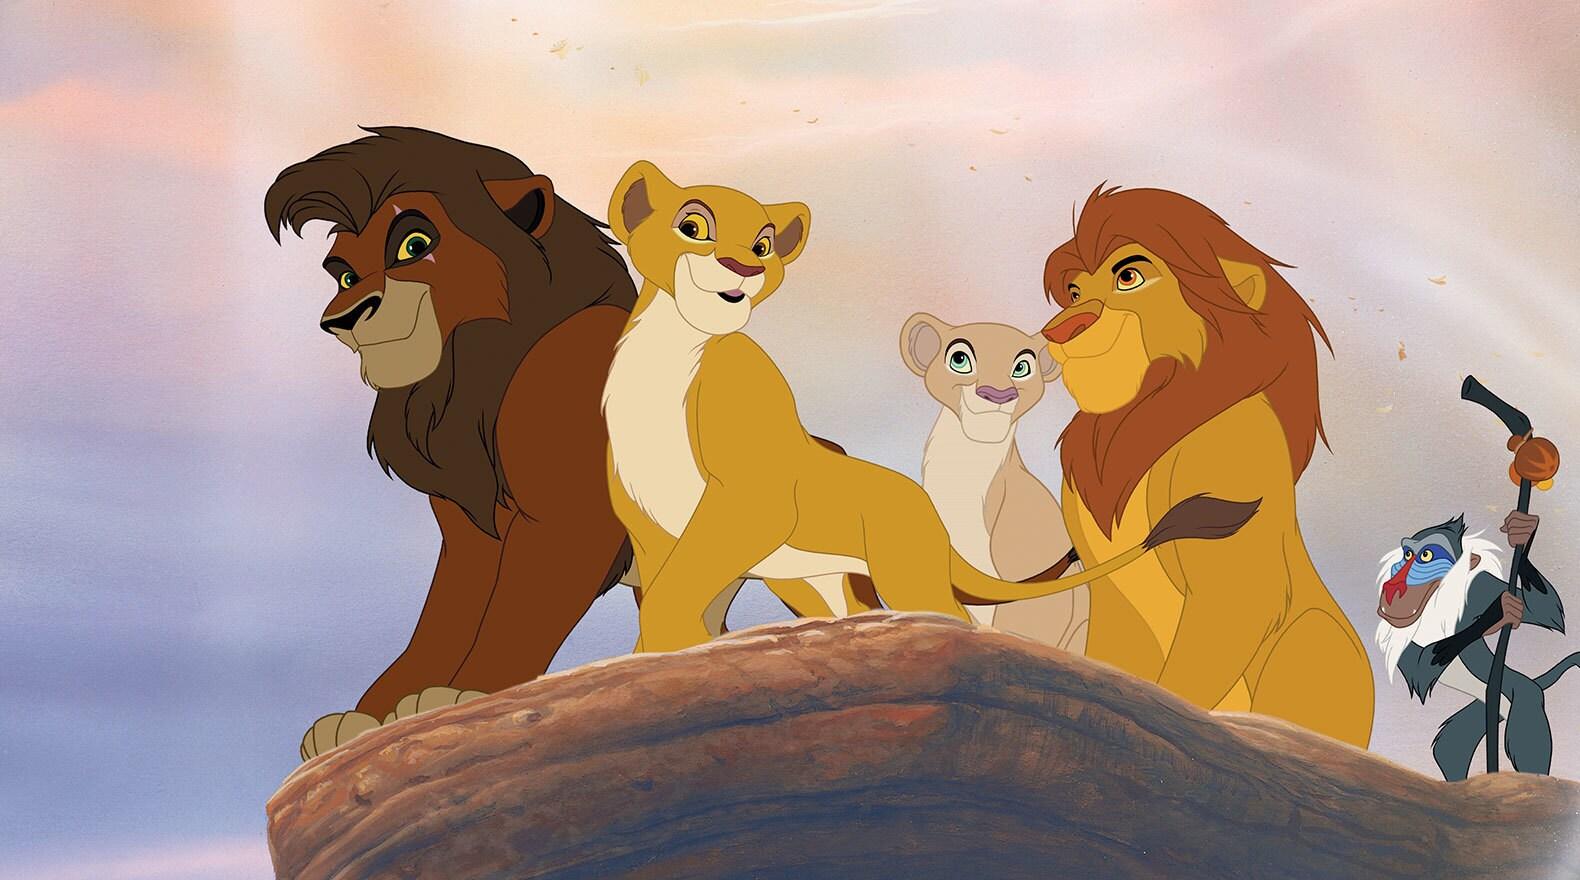 Nala, Simba, Kovu and Kiara spend time with Rafiki and look out over the pride.